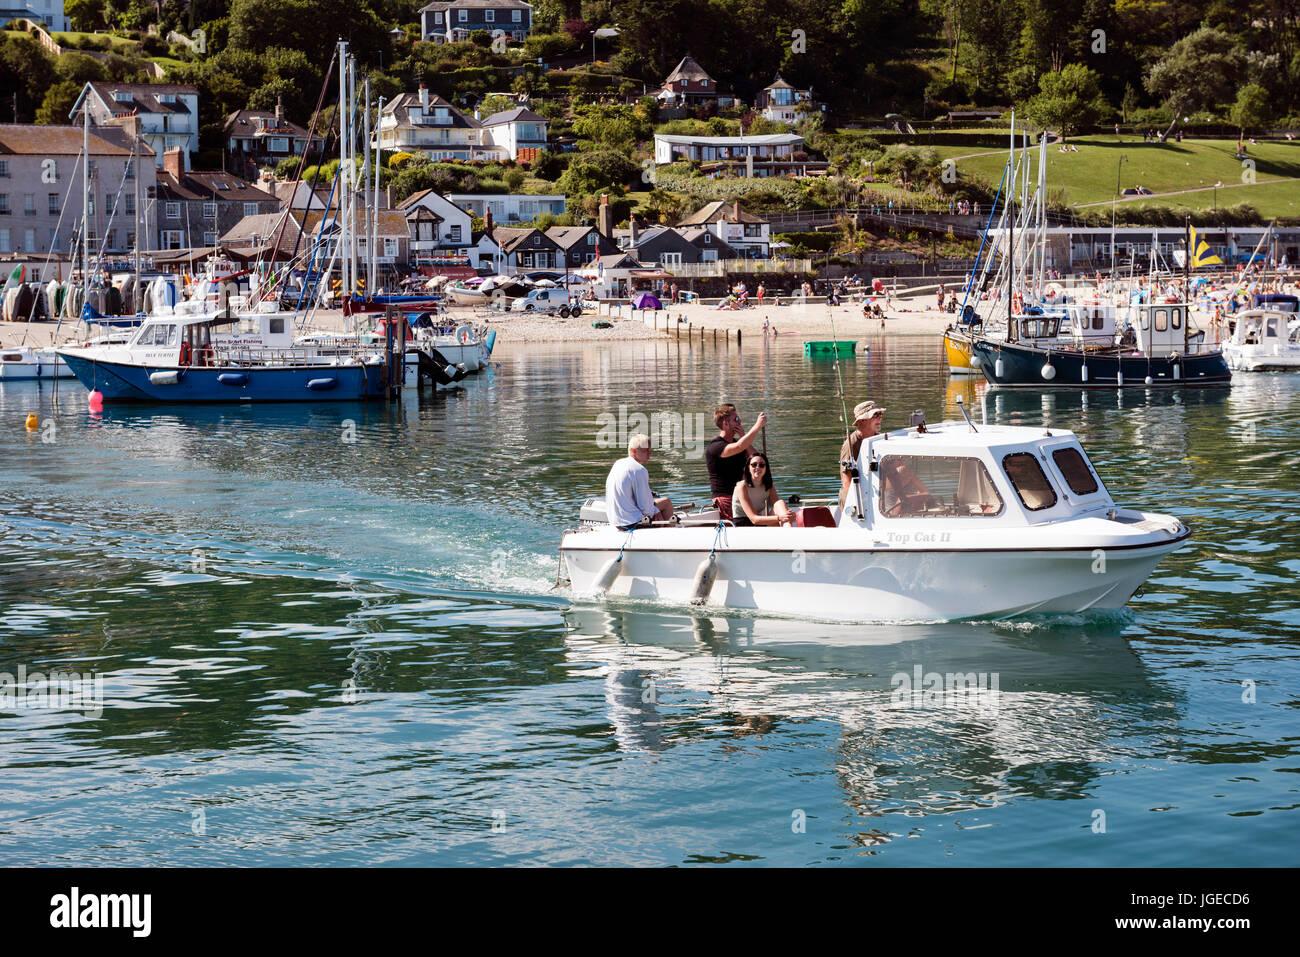 people-on-a-boat-at-the-harbour-lyme-regis-dorset-uk-JGECD6.jpg